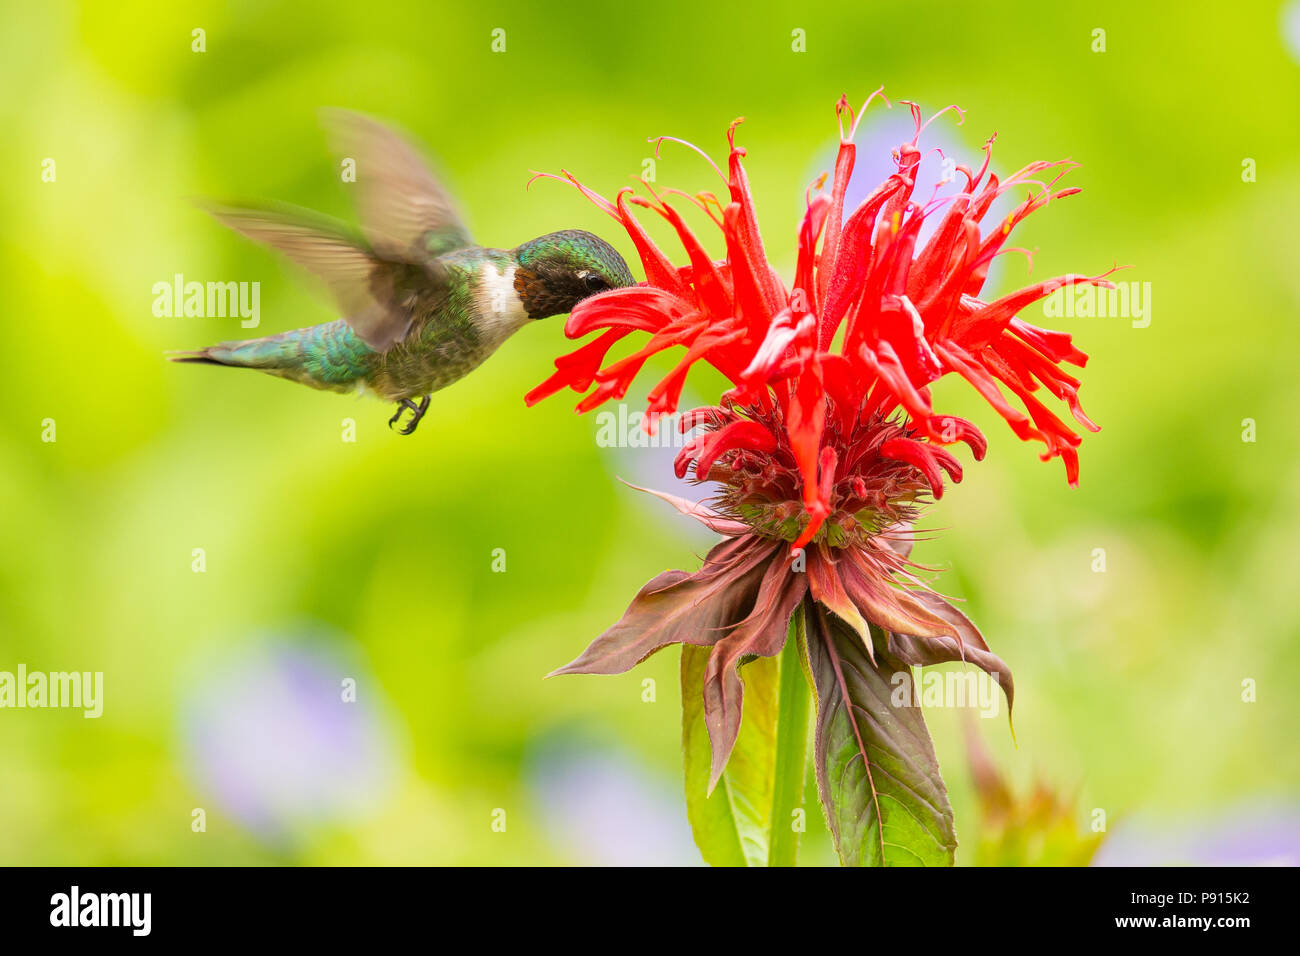 a-male-ruby-throated-hummingbird-archilochus-colubris-feeding-at-monarda-or-bee-balm-in-a-garden-in-speculator-ny-usa-P915K2.jpg